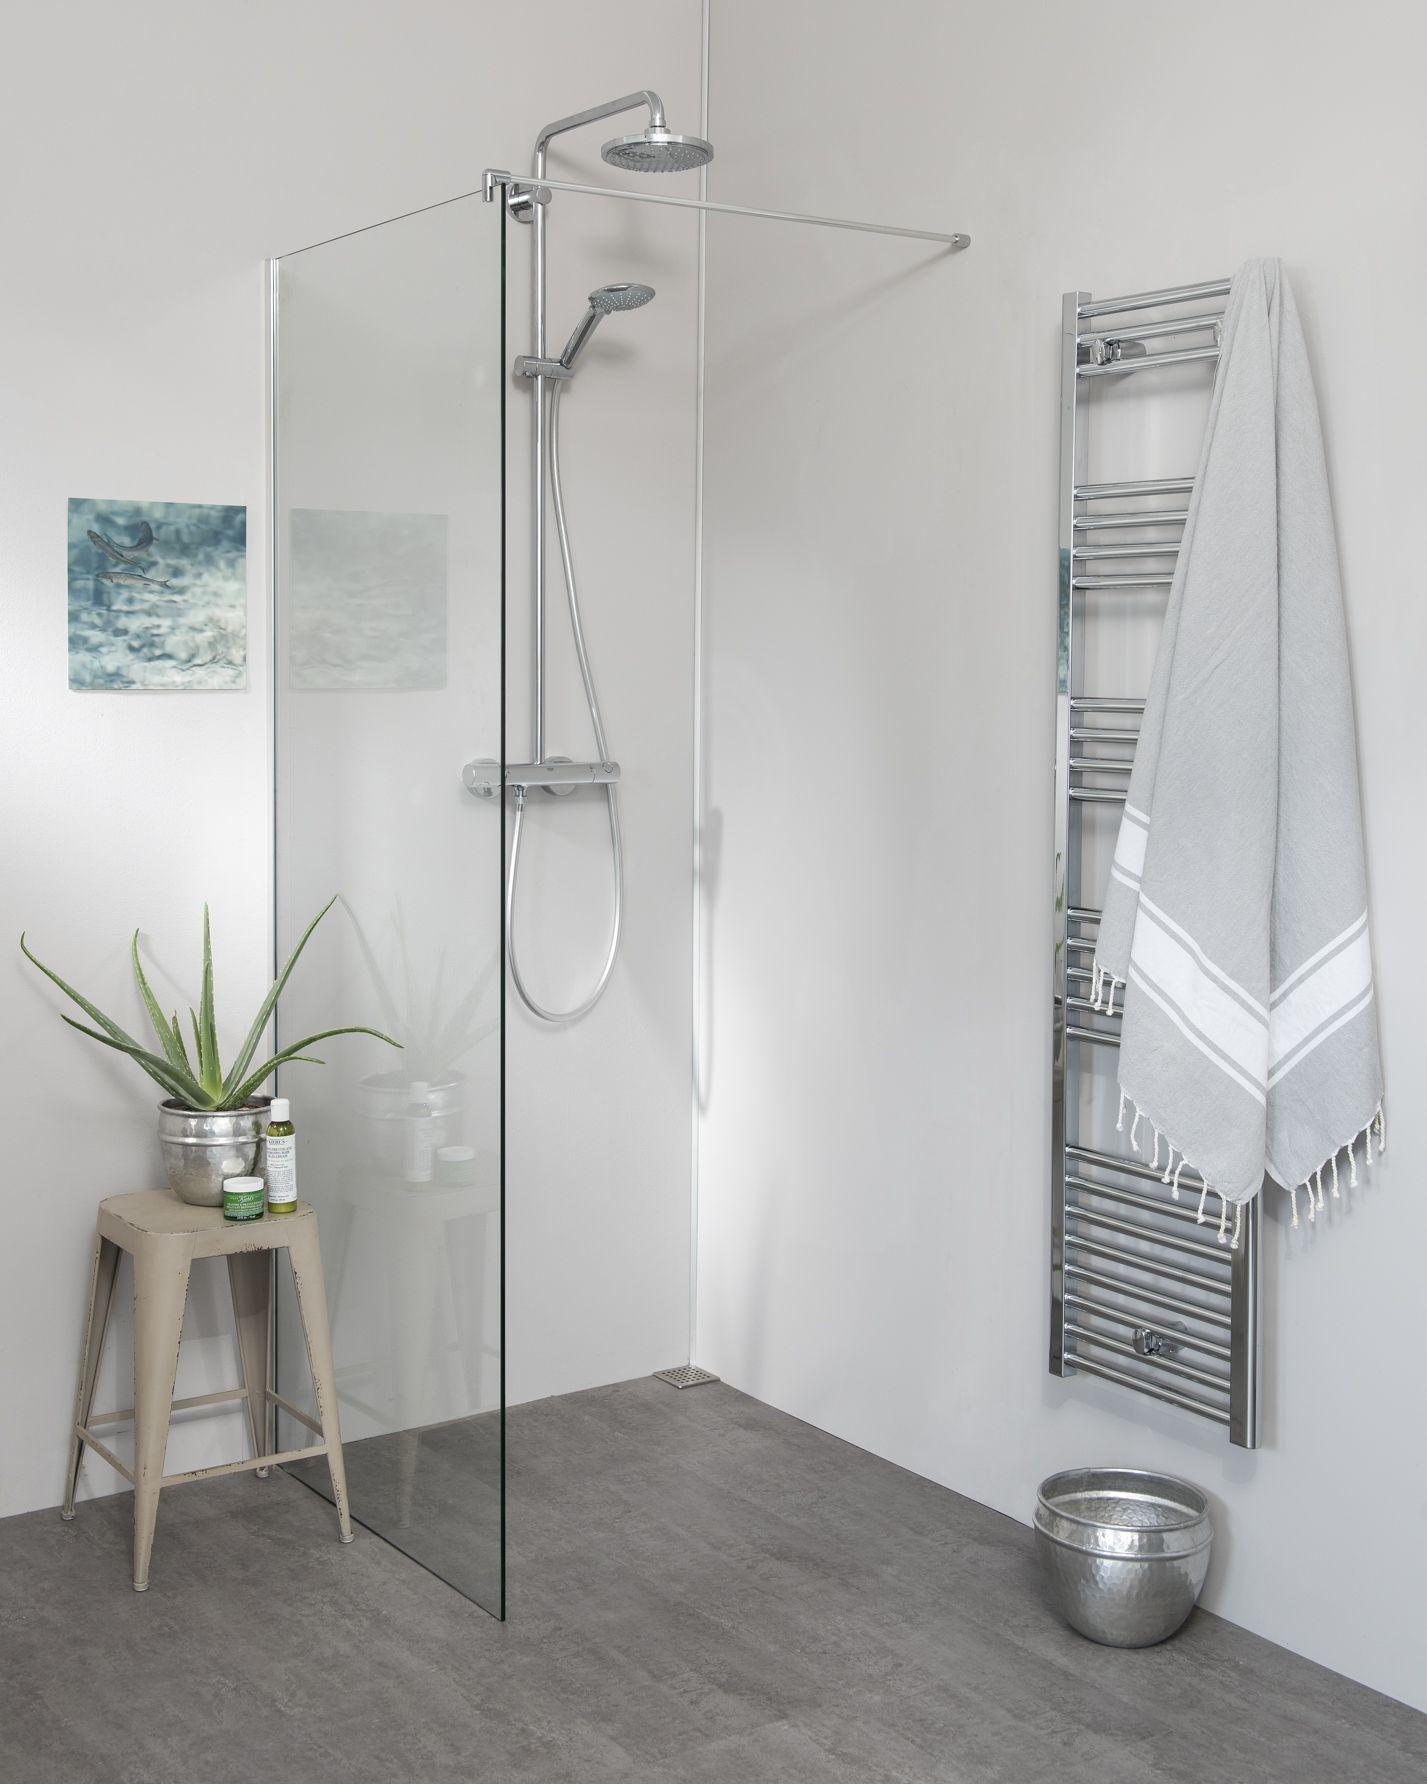 Begehbare Dusche Duschwand mit Klemm Wandanschlussprofil